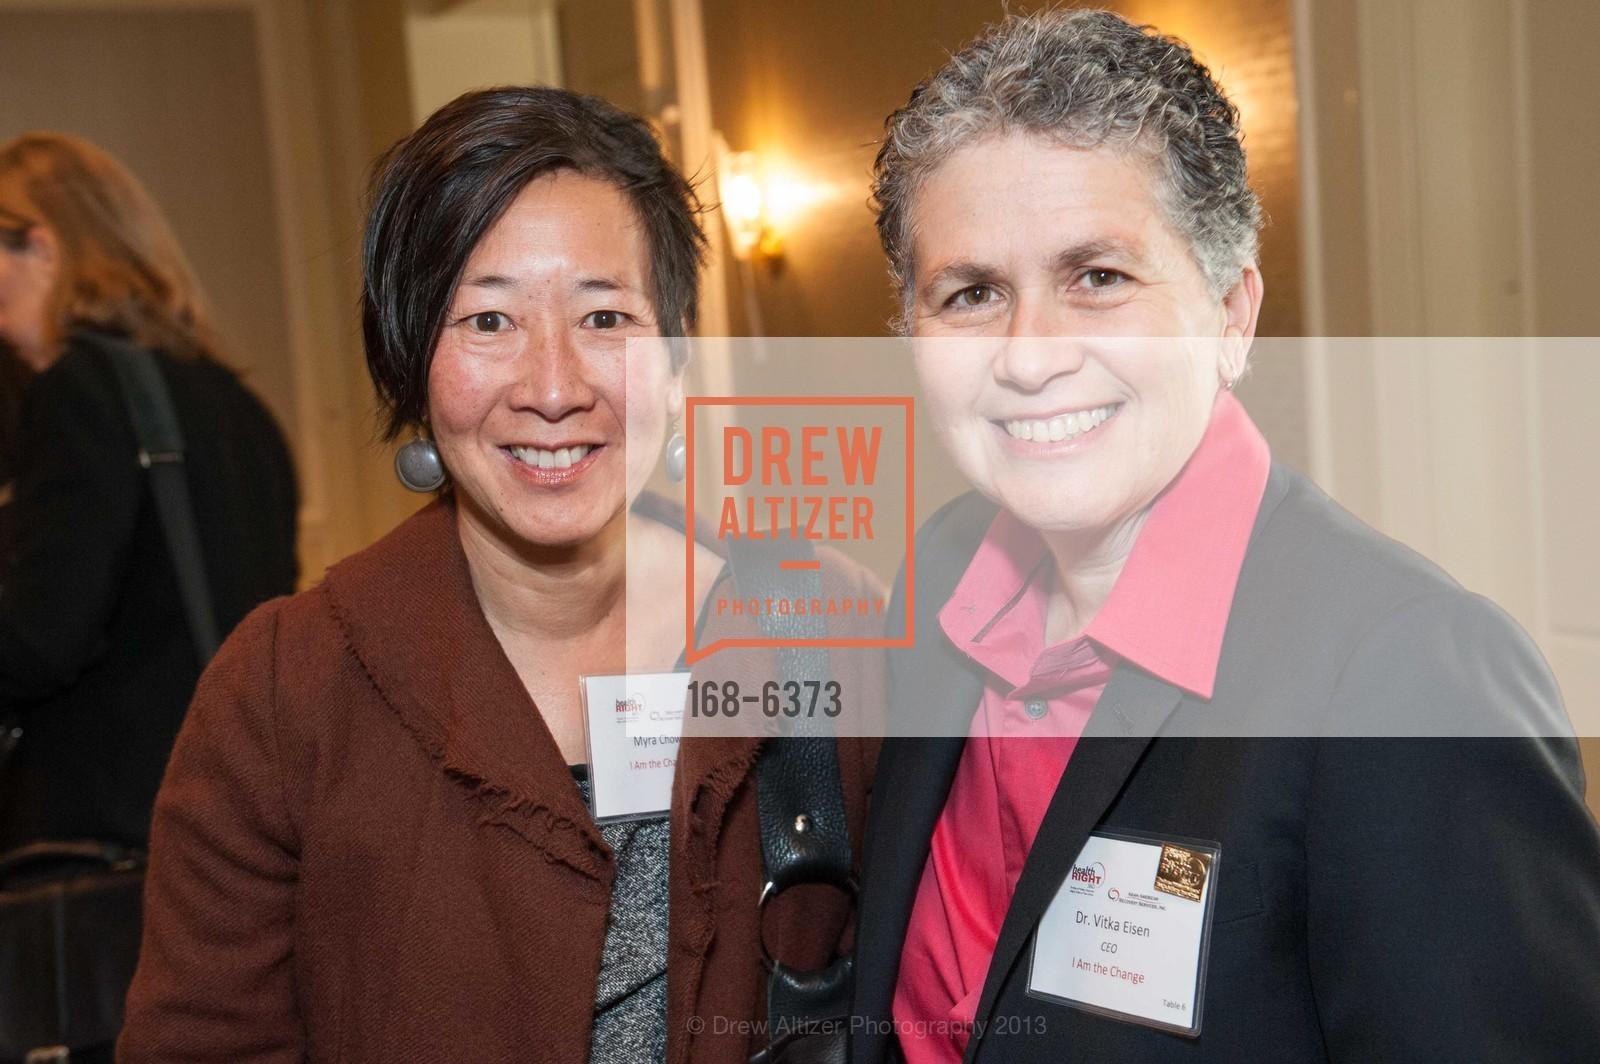 Myra Chow, Vitka Eisen, HEALTH RIGHT 360:  Be the Change 2013, US, November 8th, 2013